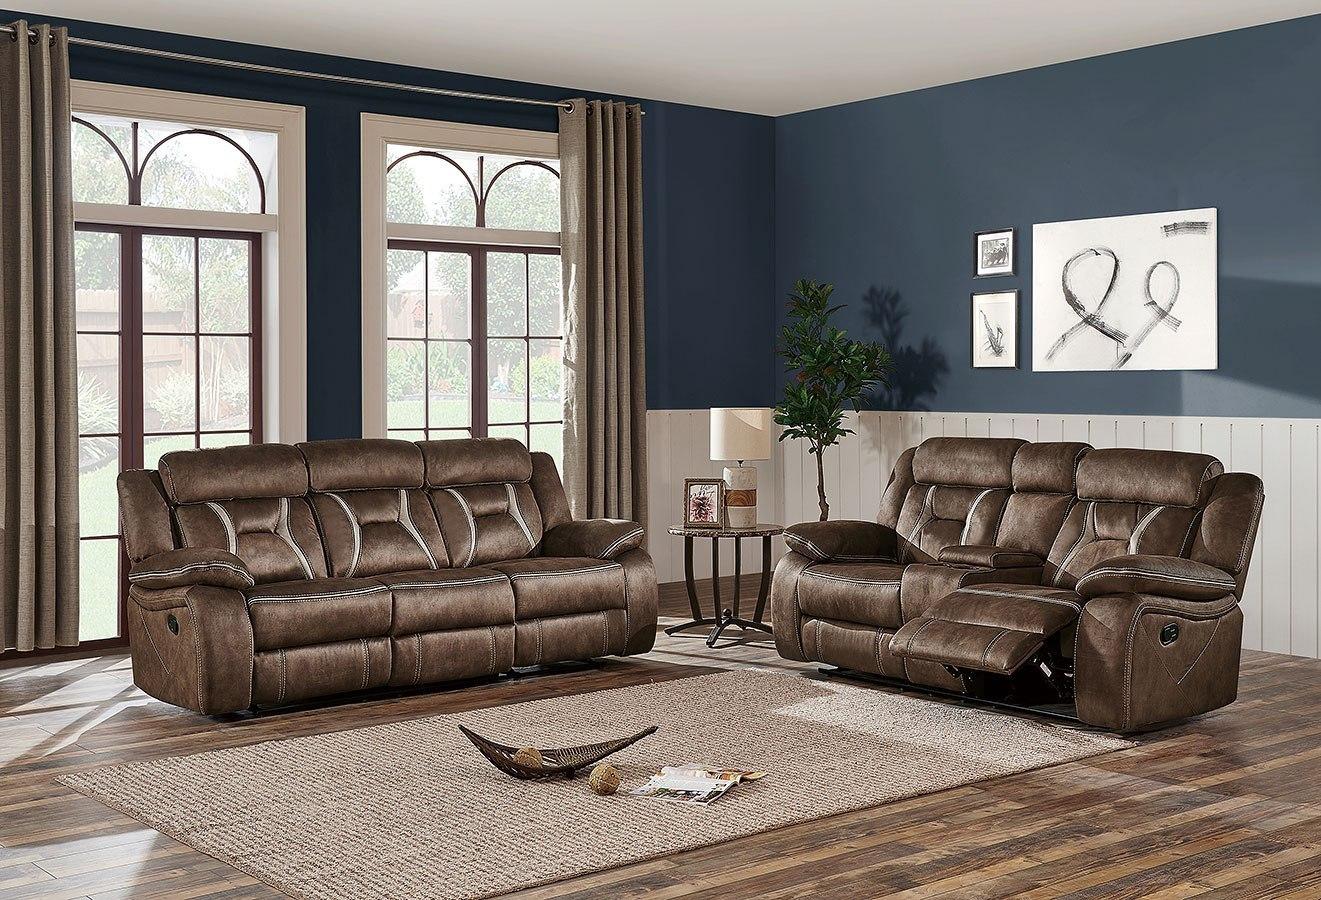 U0070 Reclining Living Room Set